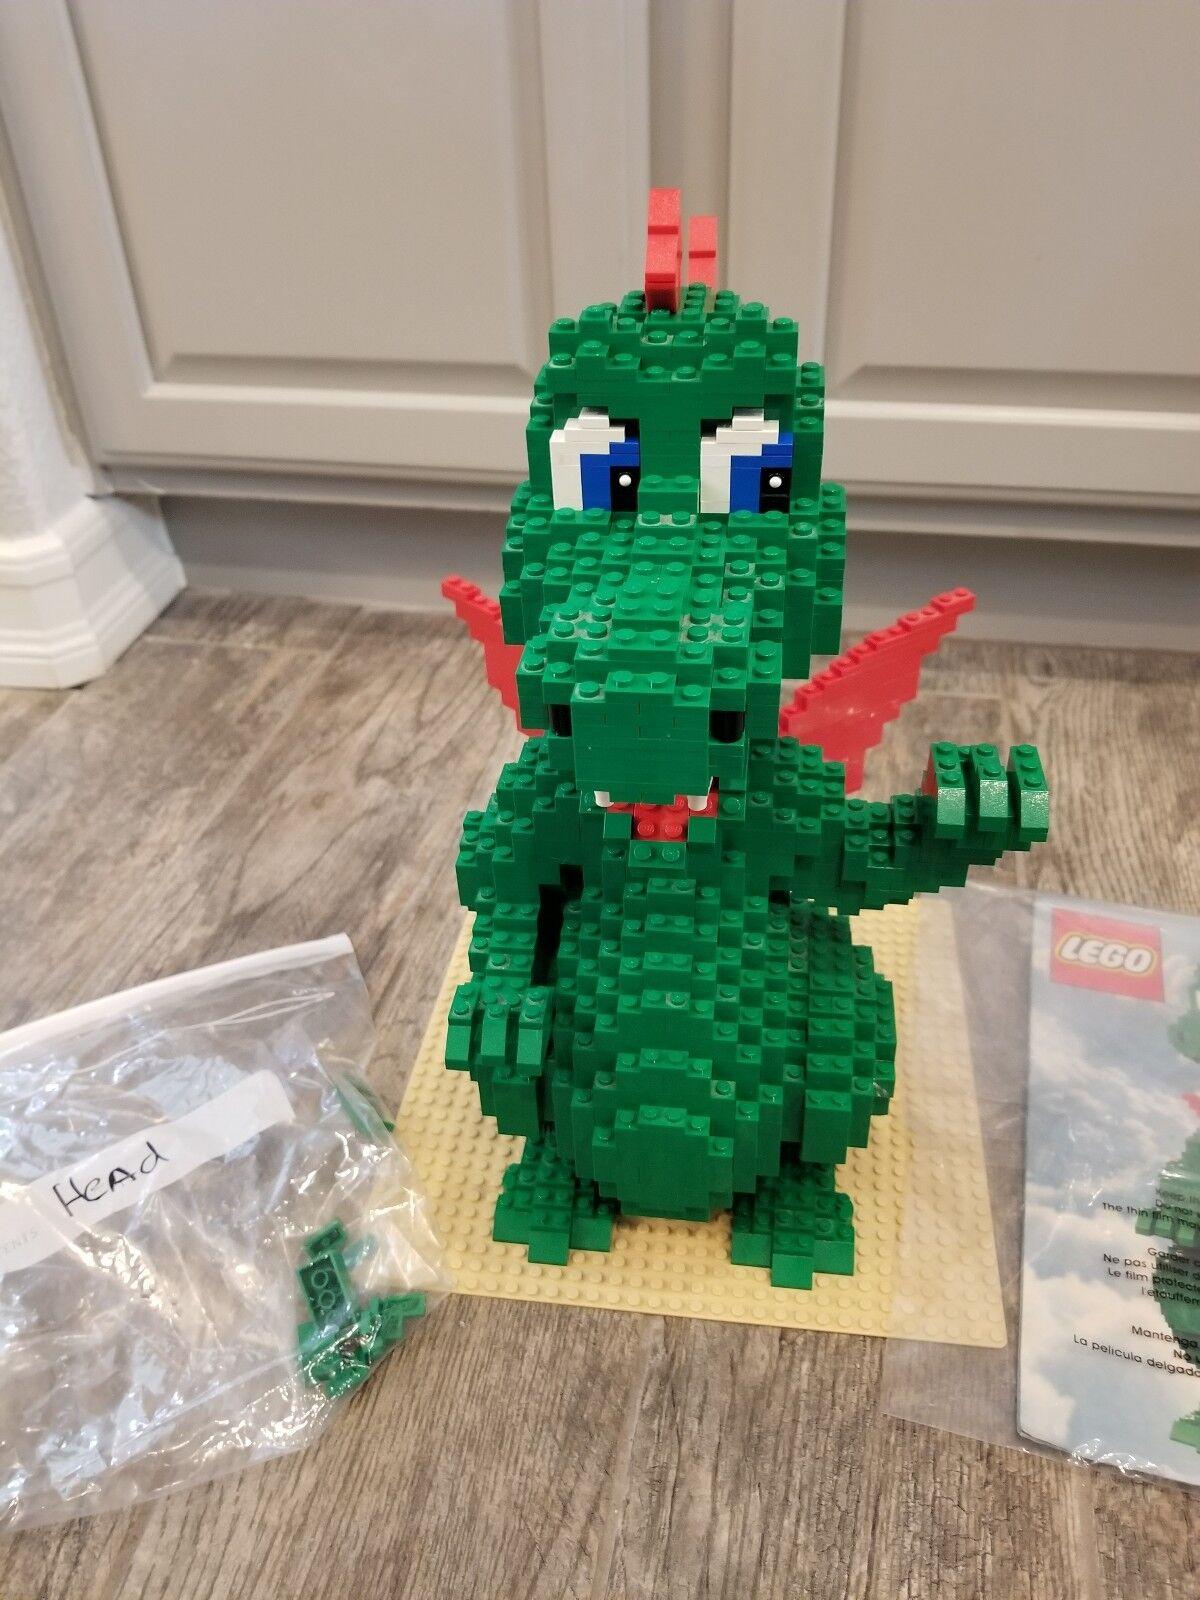 LEGO Grün Dragon SCULPTURE 3724 - - - COMPLETE - No box decc67